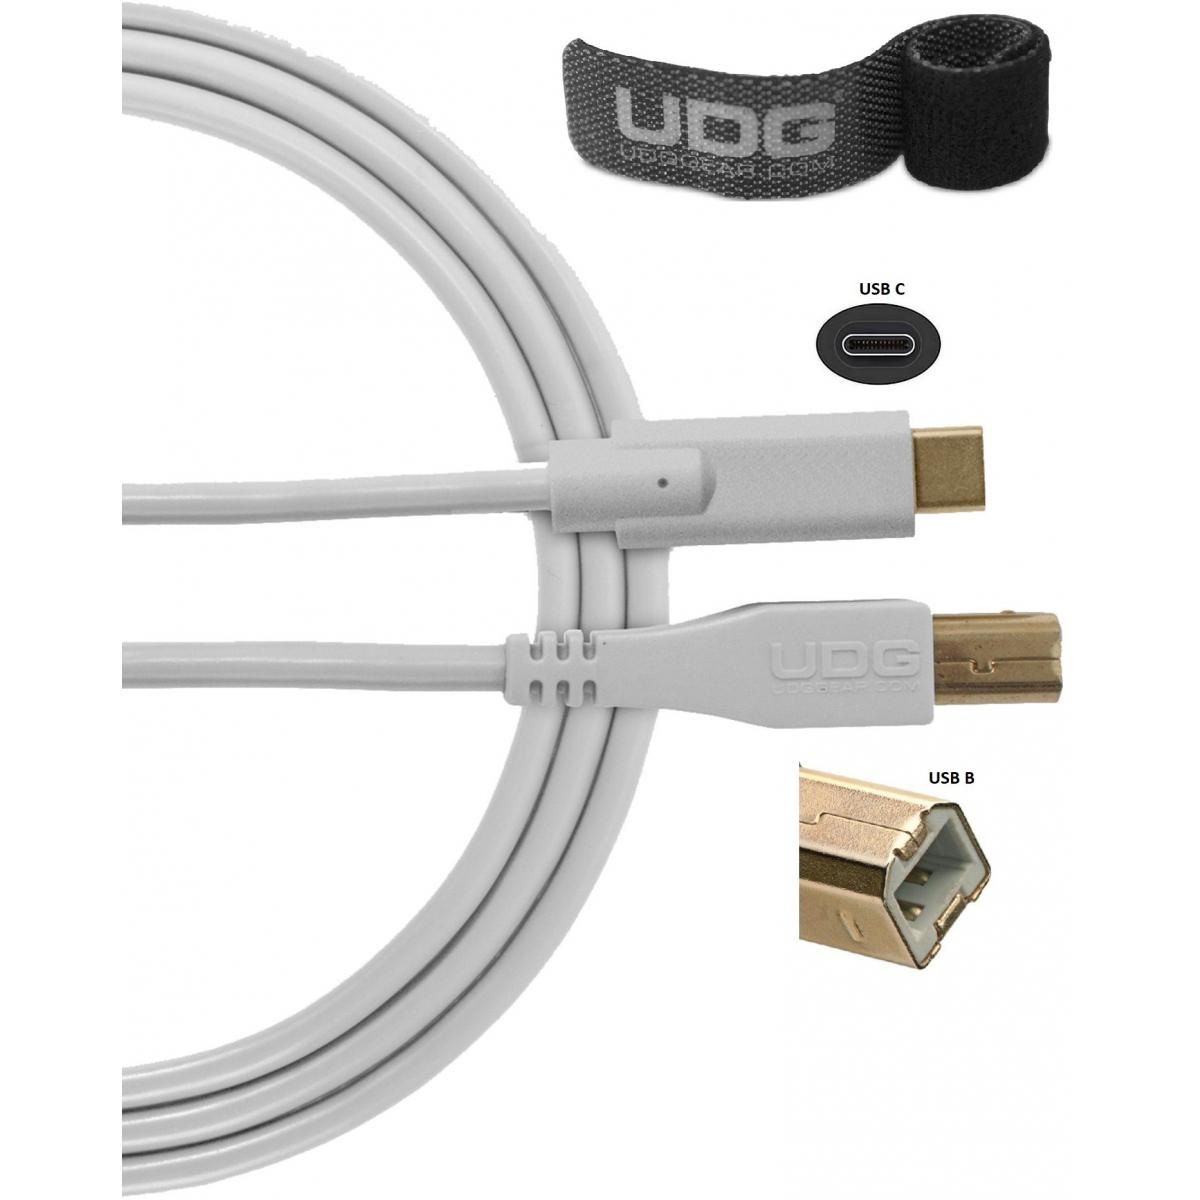 Câbles mini USB A vers B - UDG - U96001WH (1,5 mètres)